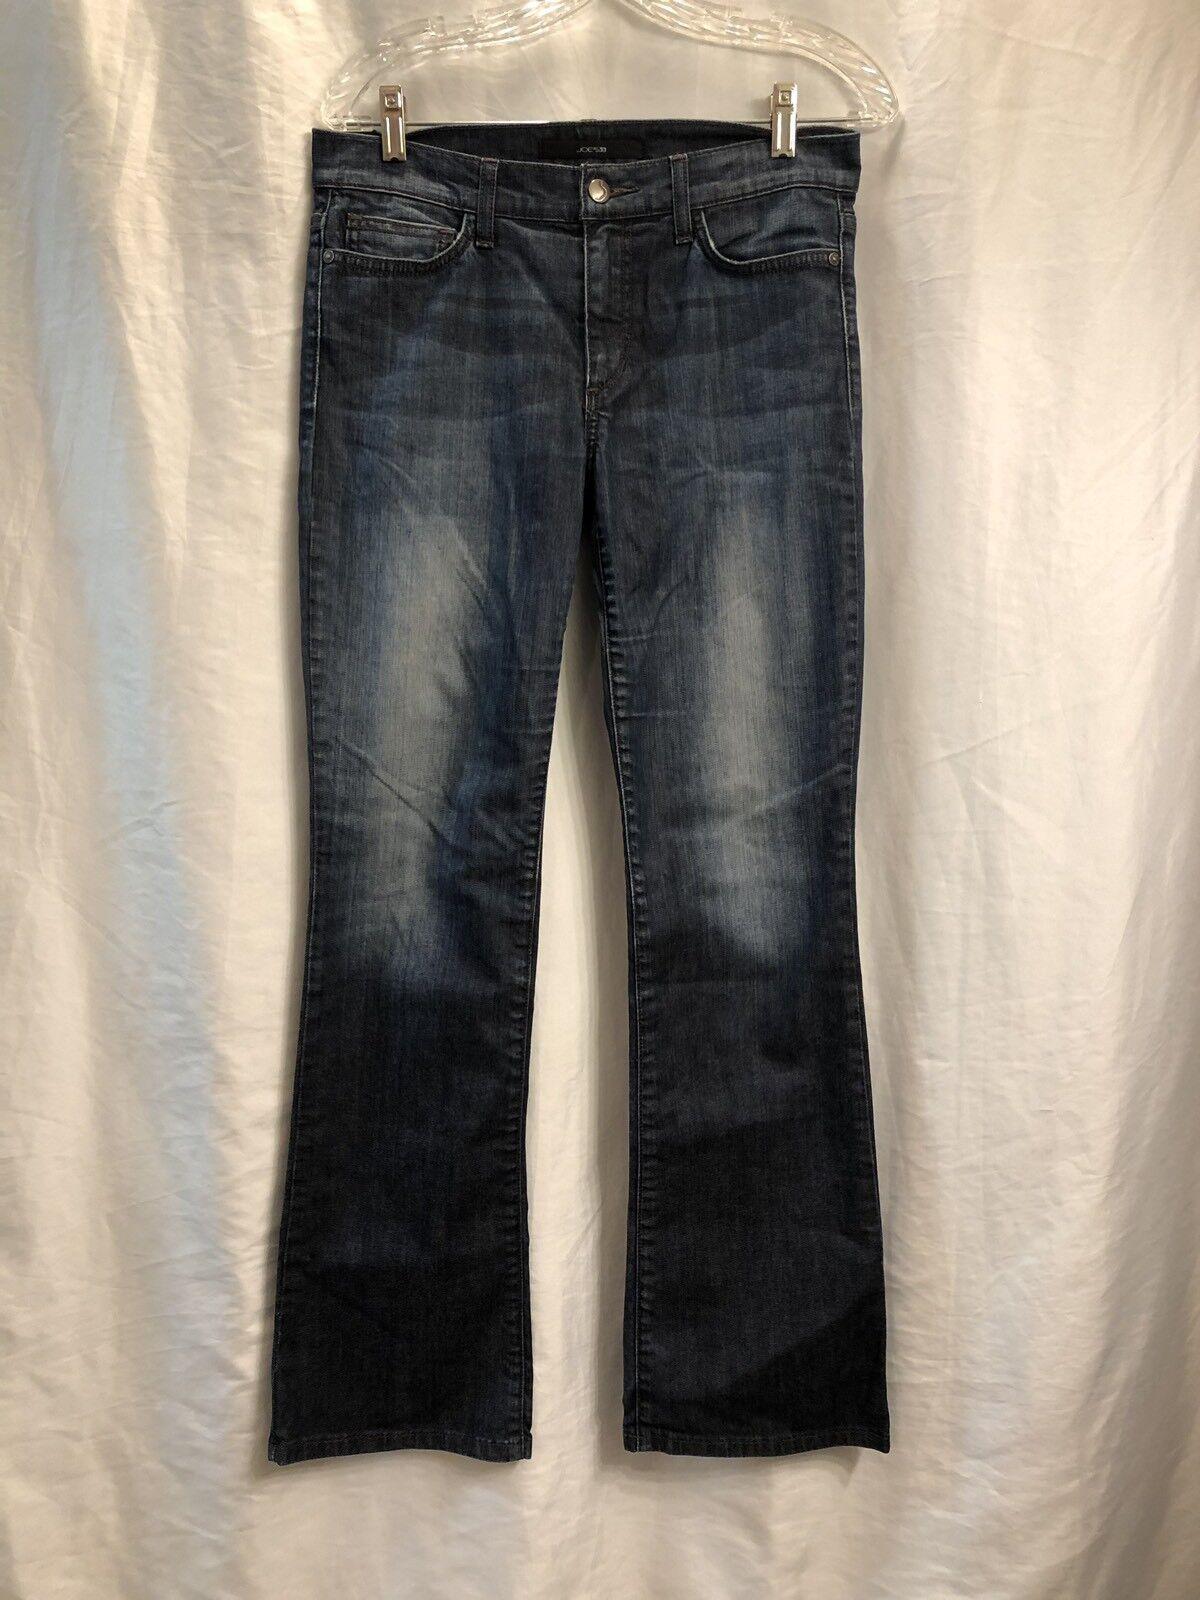 Joes Womens W27 Provocateur Dark Wash Jeans Flare L20P